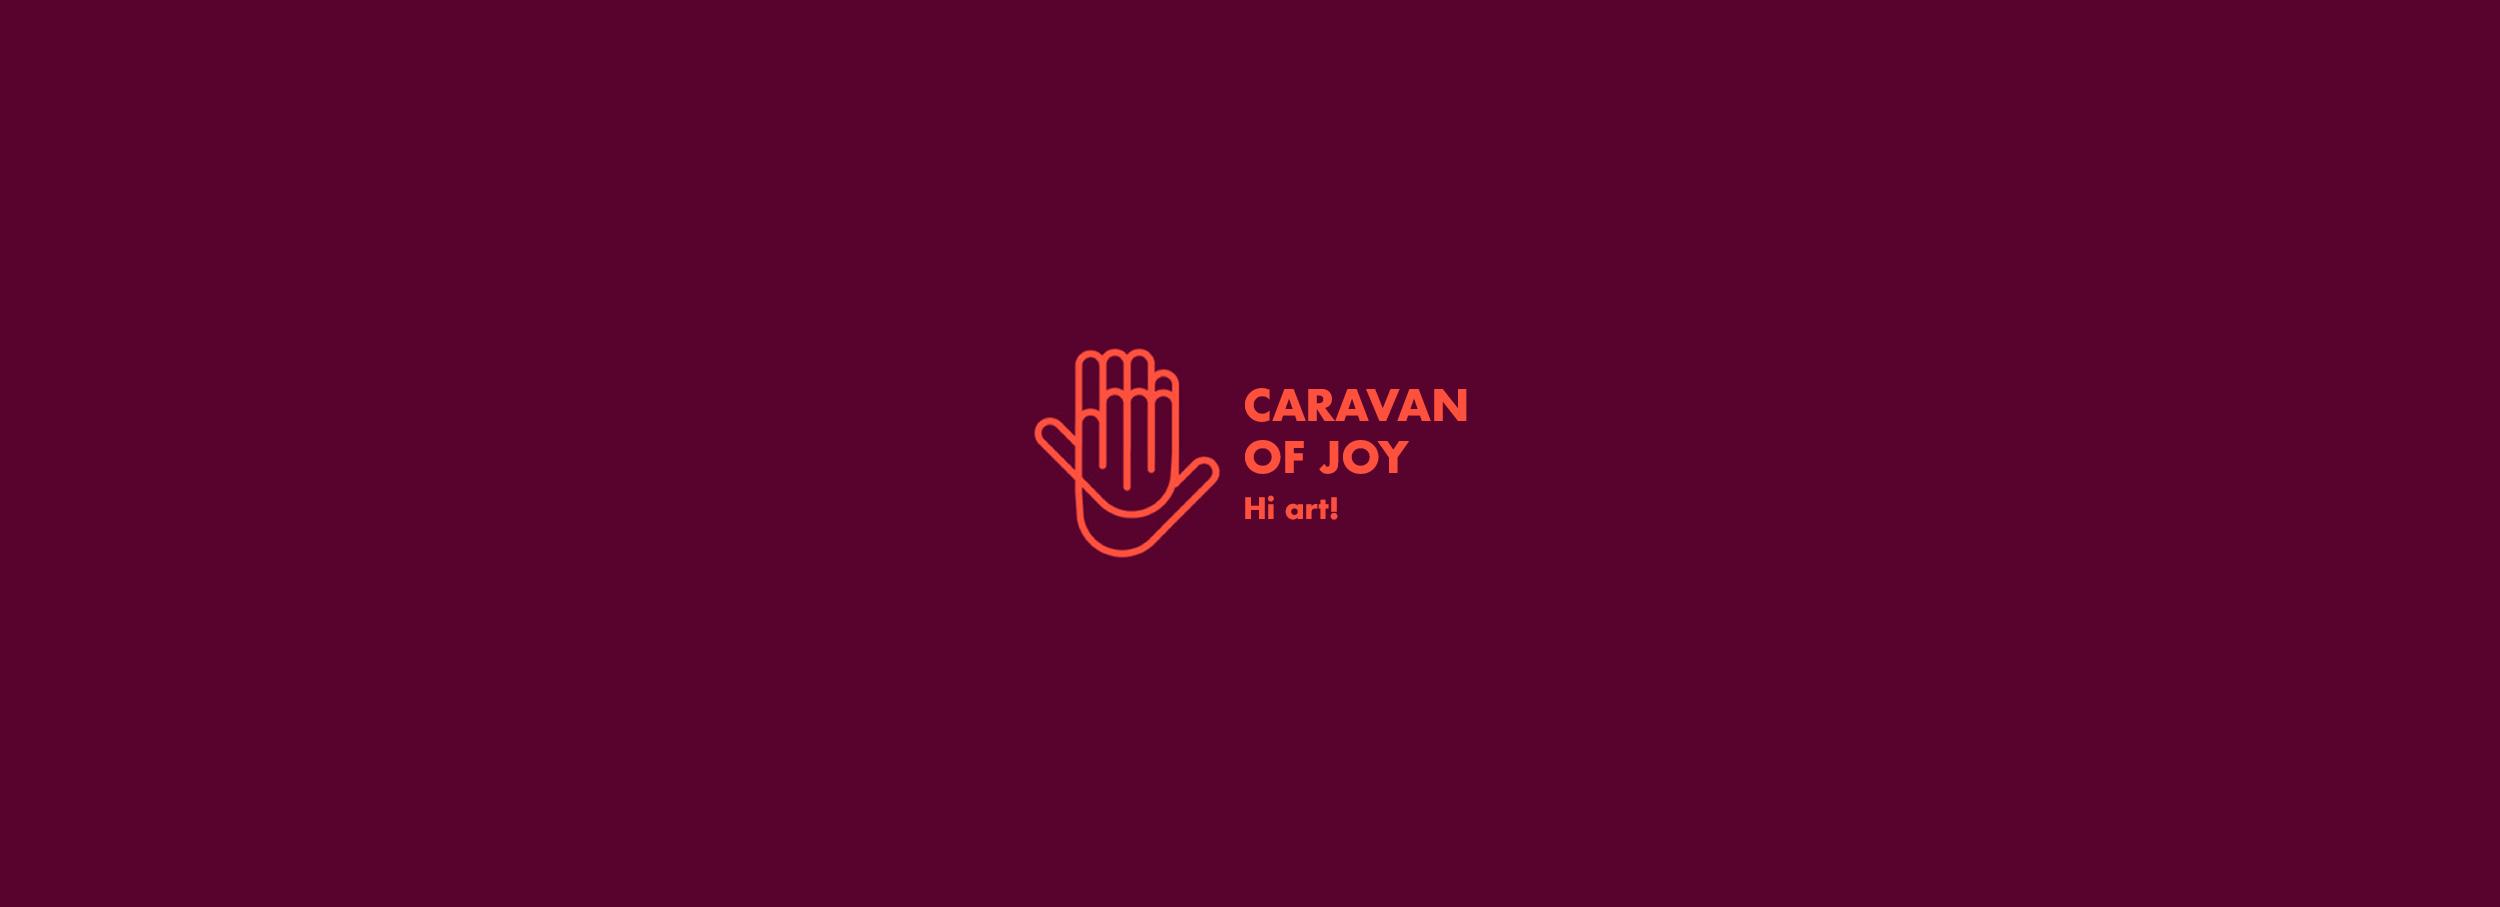 Caravan 01.png